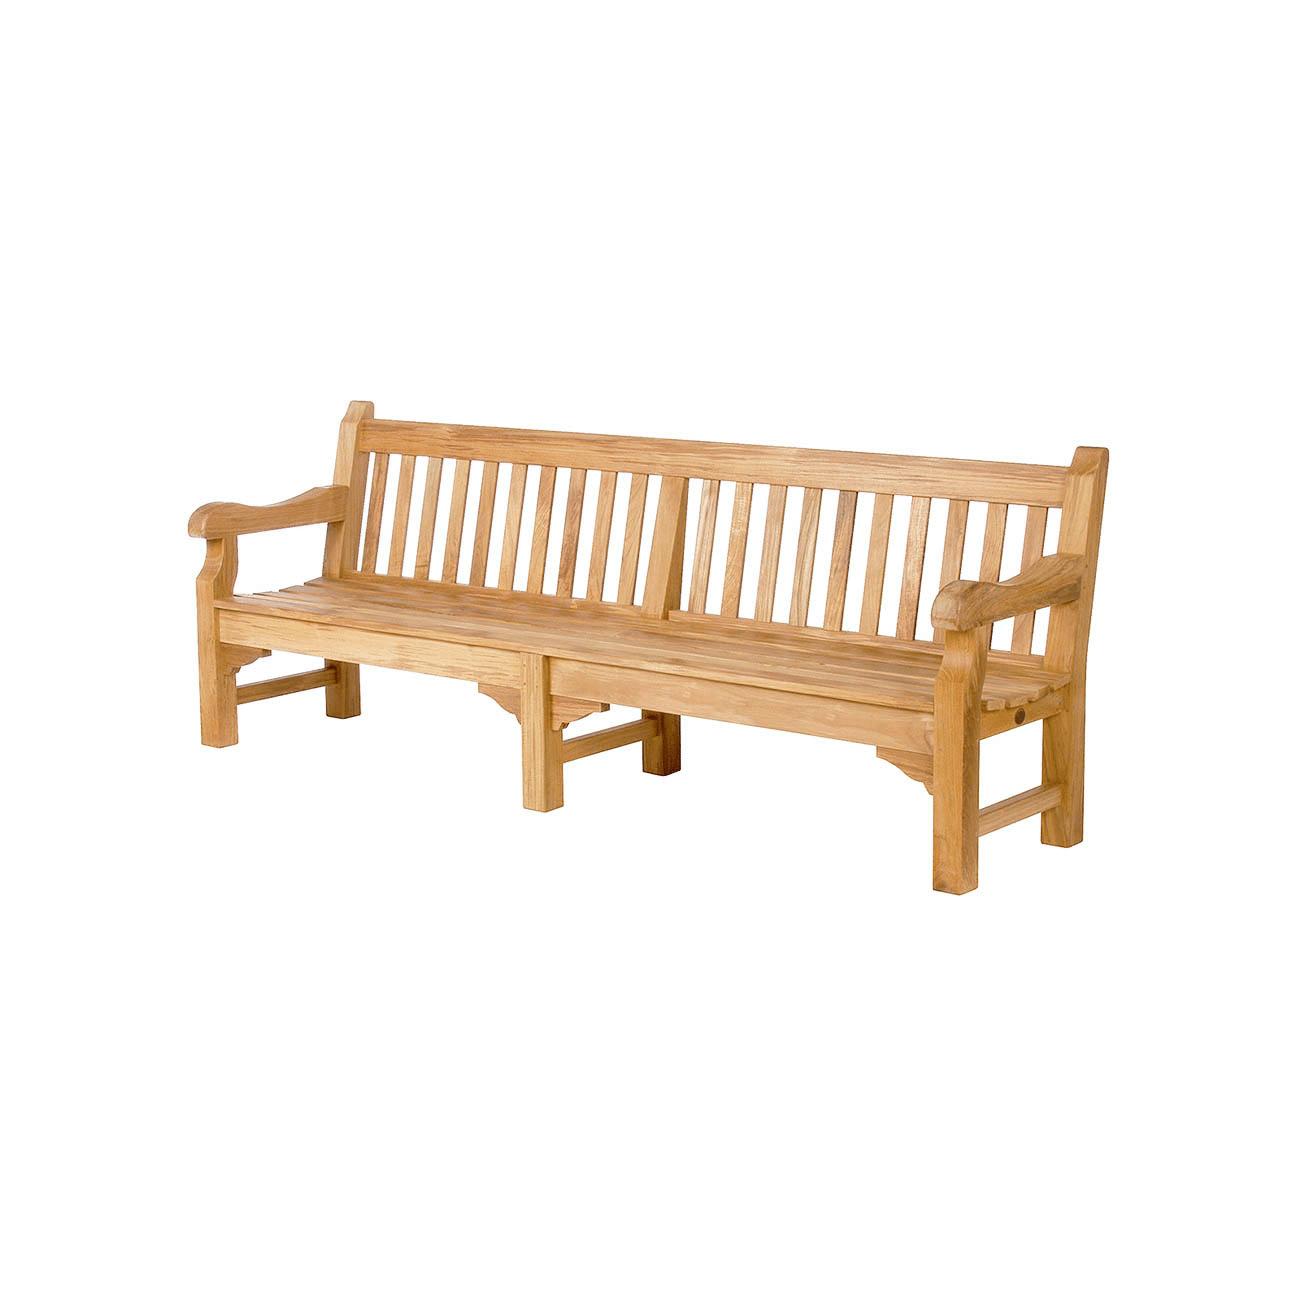 Miraculous Teak Garden Bench Gbc08 Indonesia Outdoor Furniture Machost Co Dining Chair Design Ideas Machostcouk